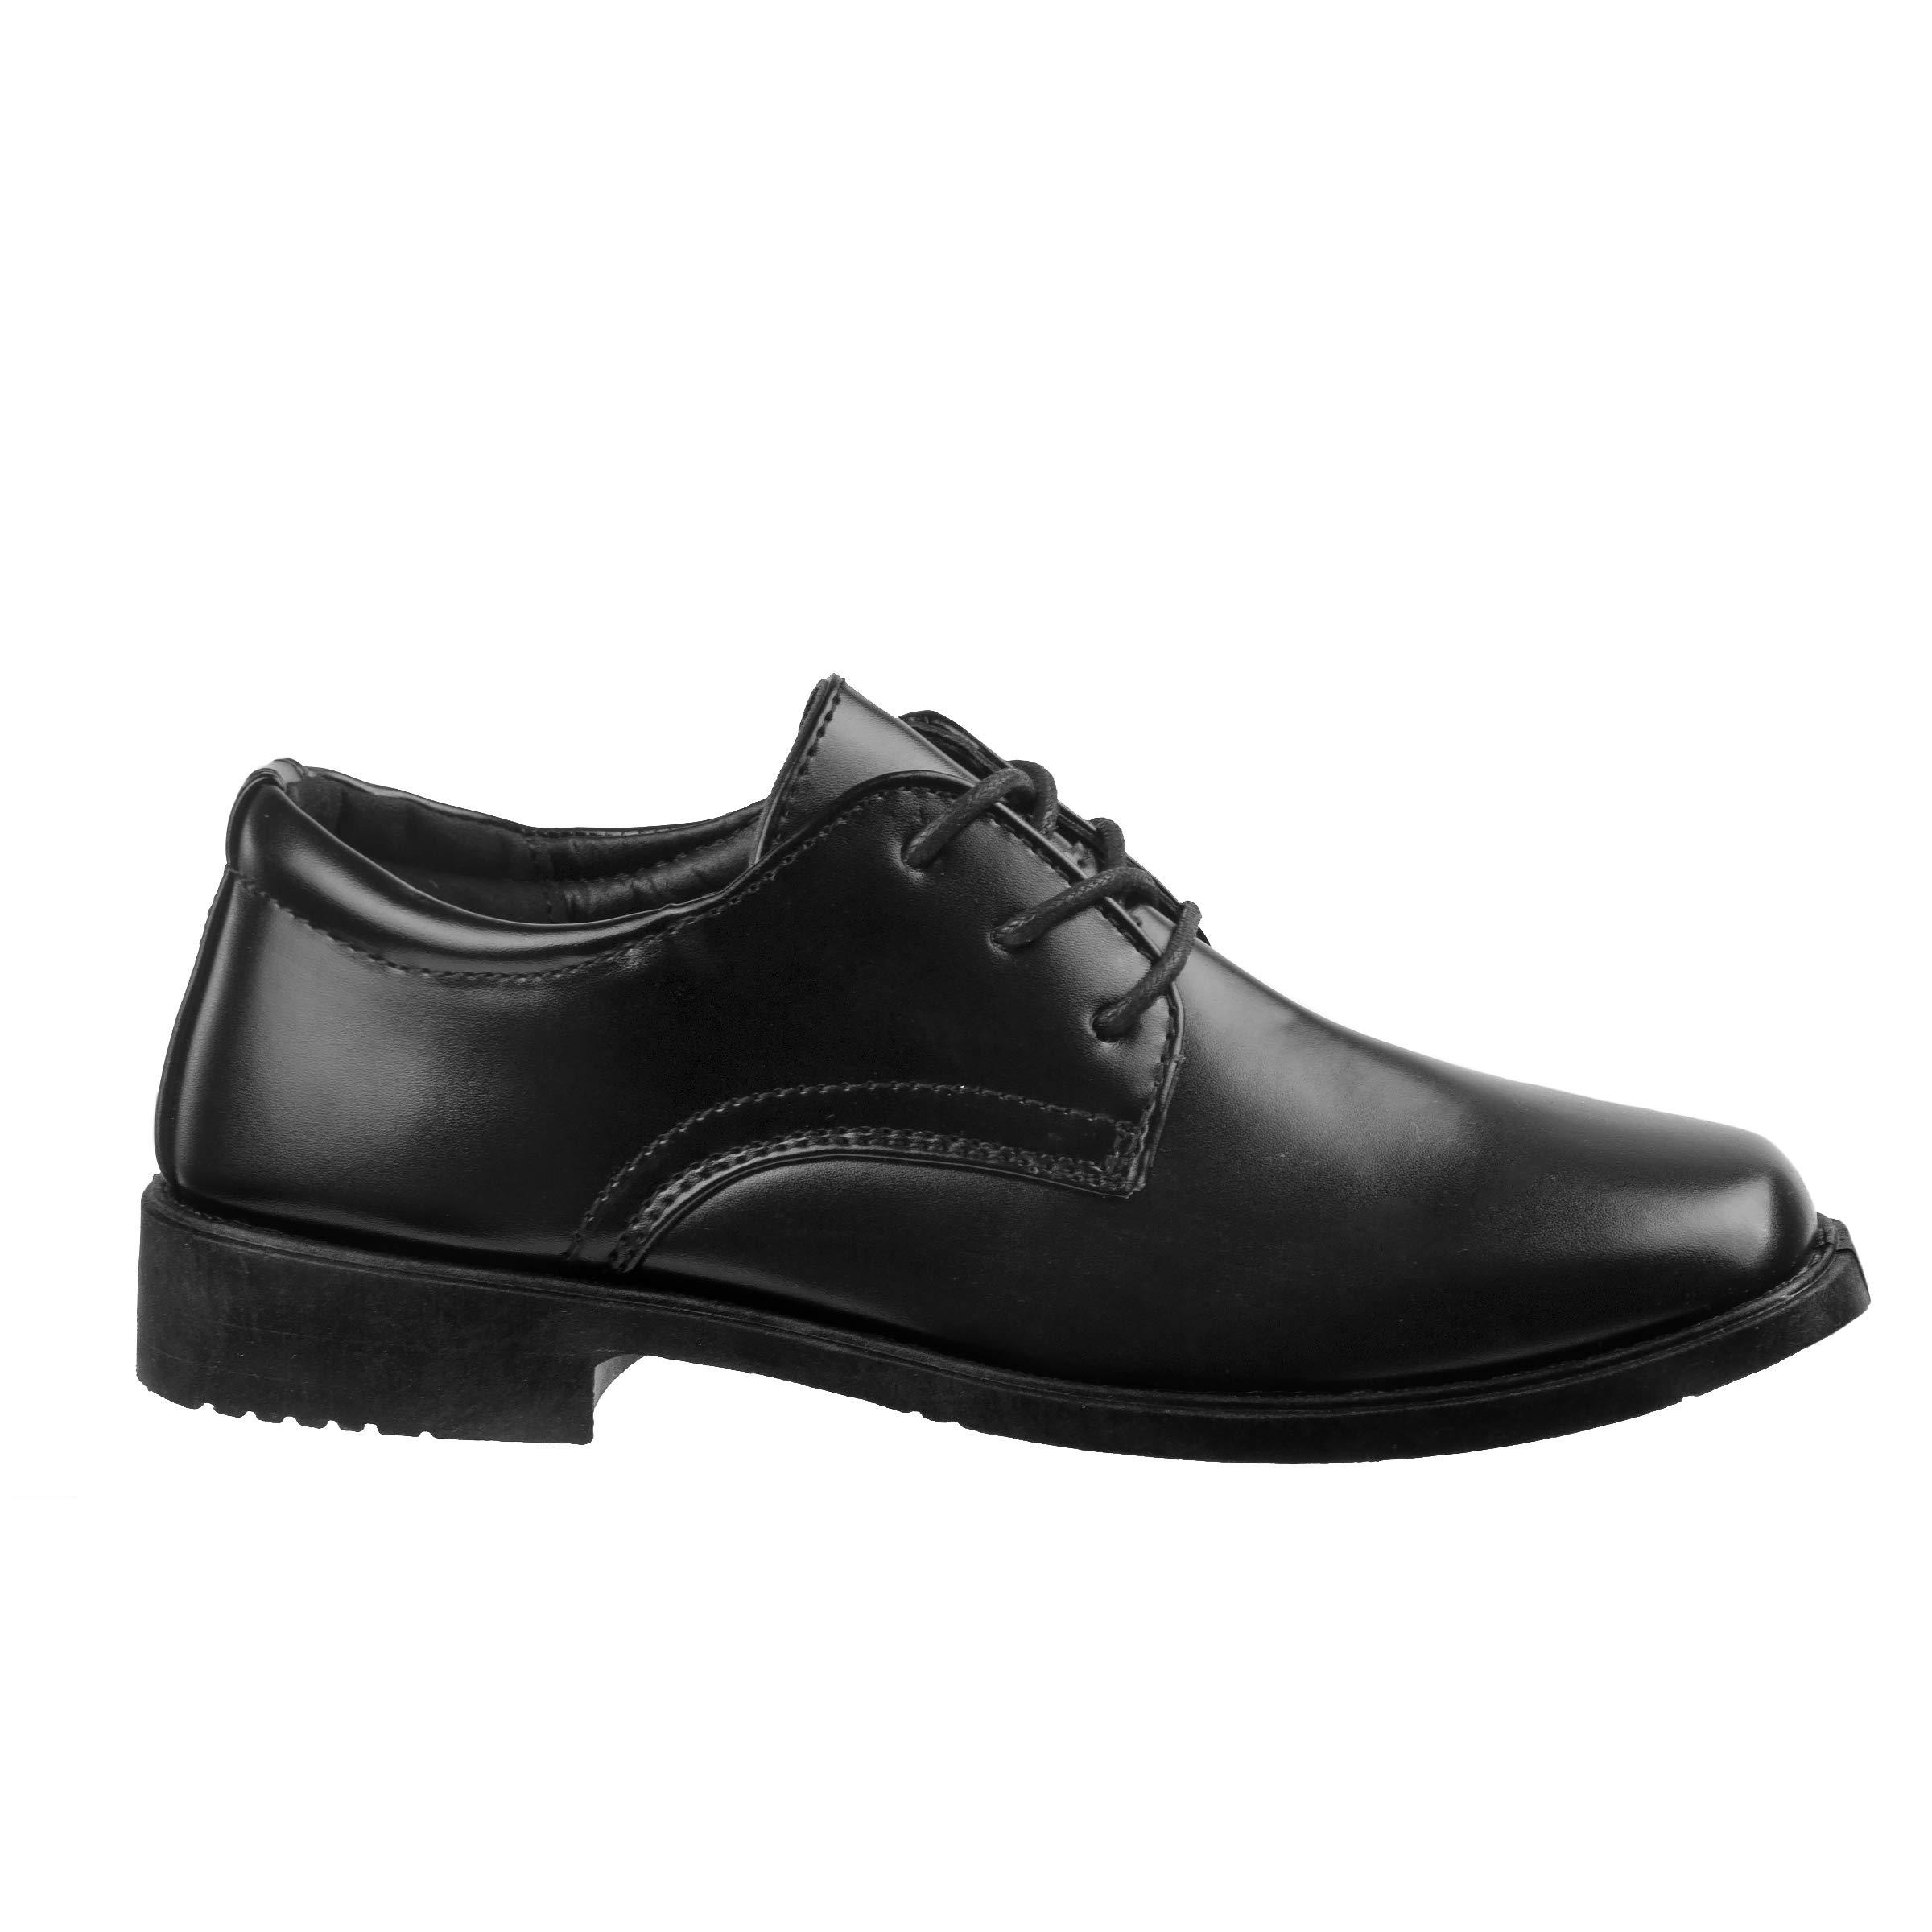 Josmo Boys Basic Oxford Casual Dress Shoe, Black, Size 5' by Josmo (Image #4)